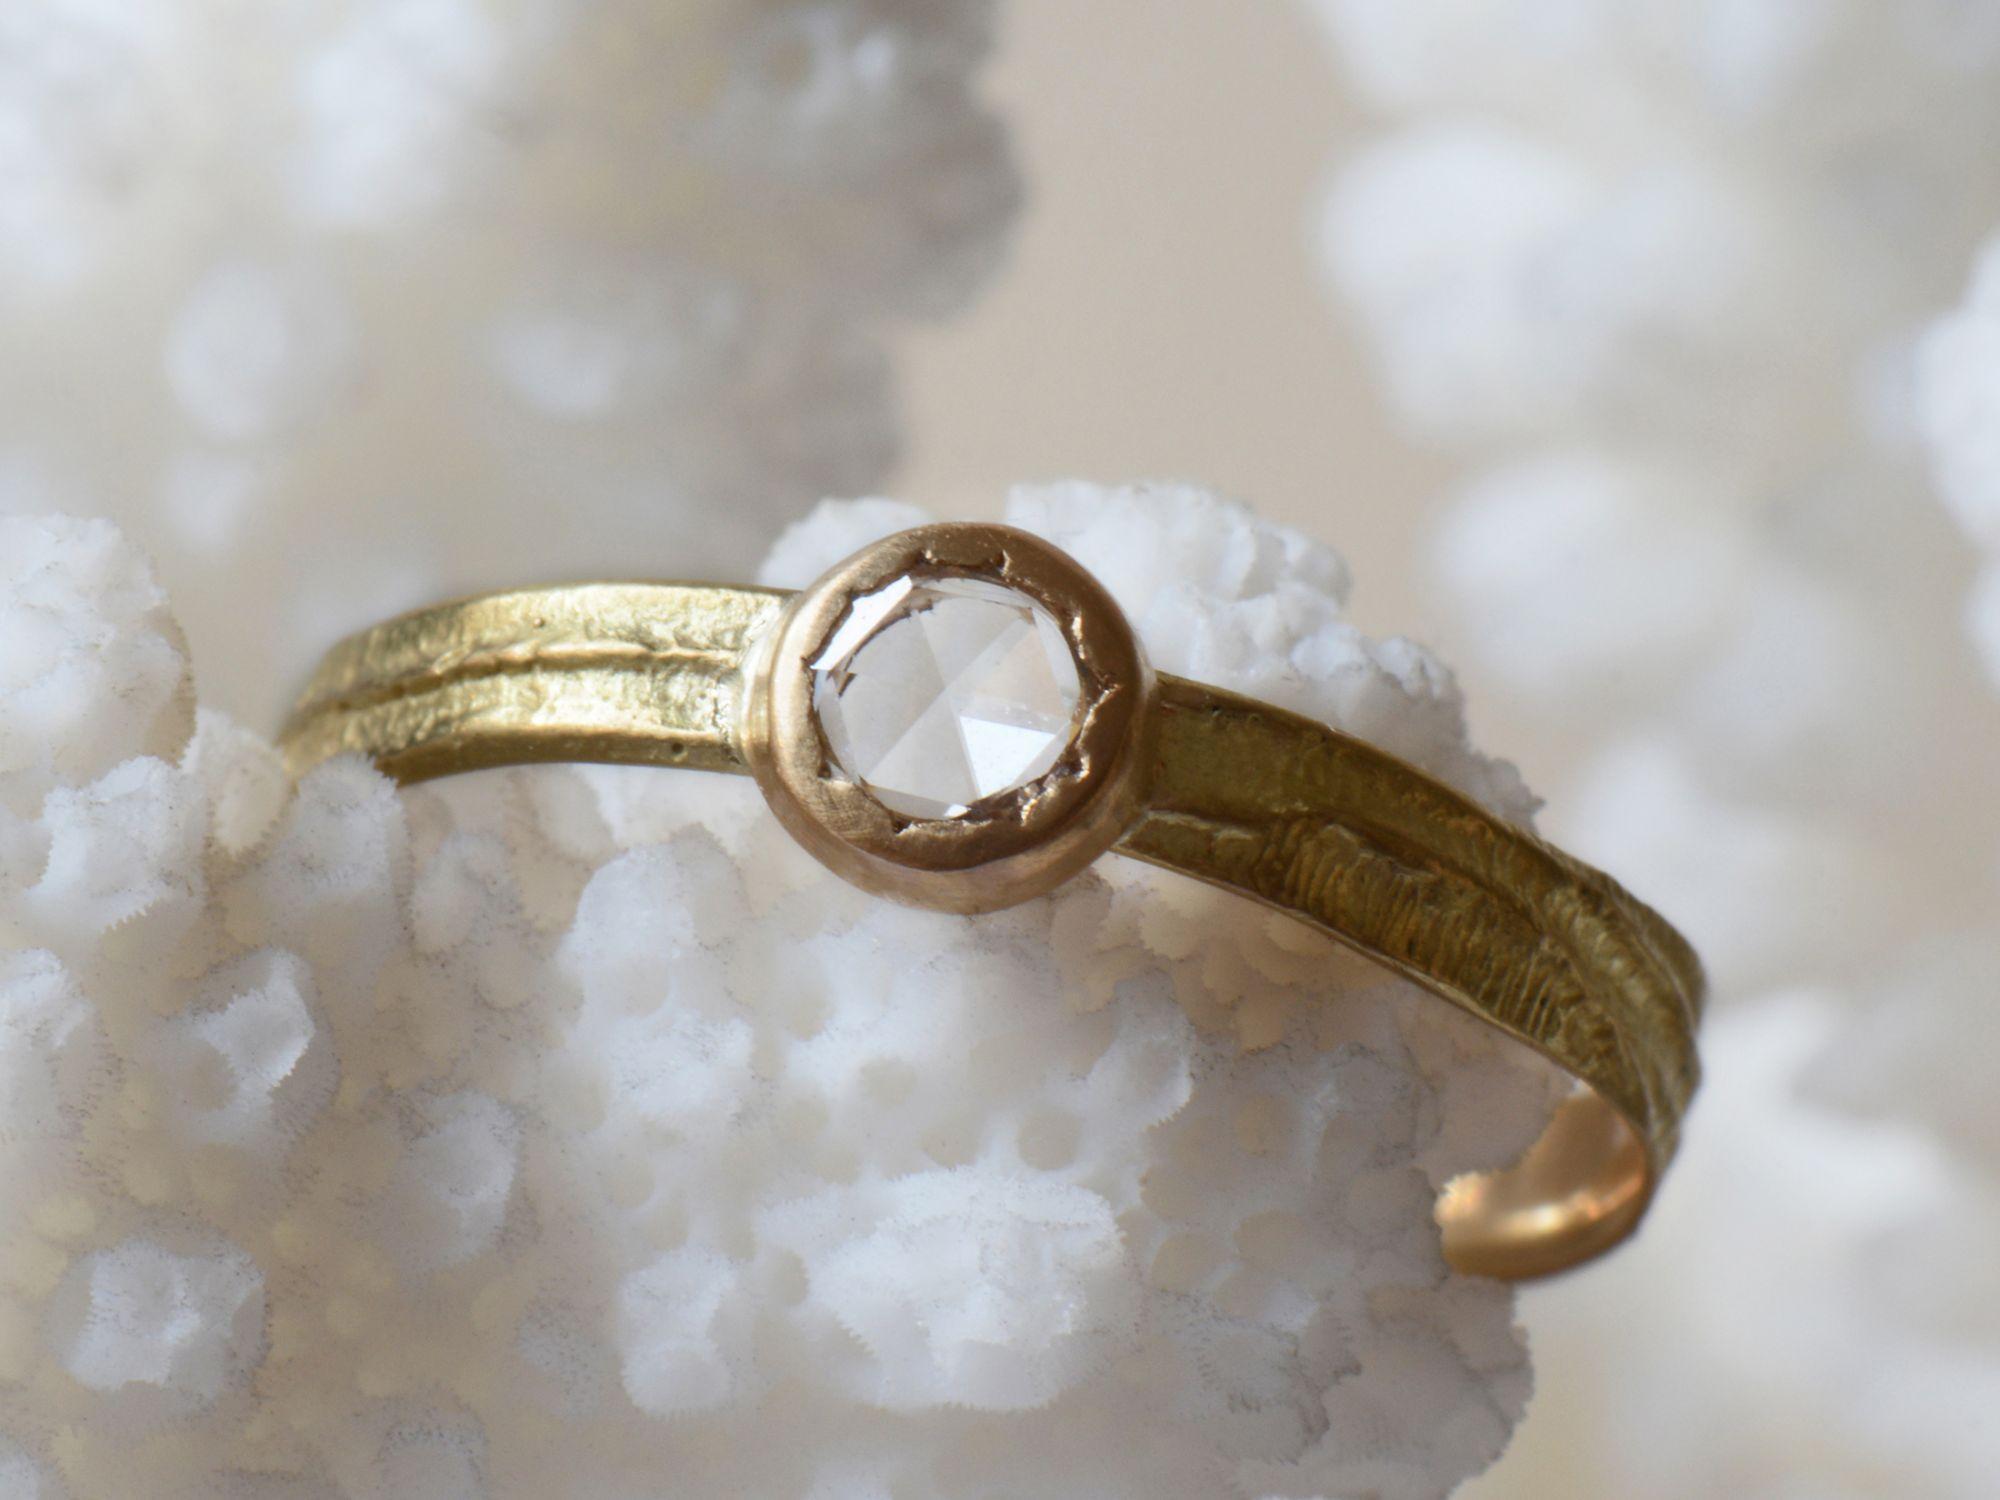 Sitia PM white rosecut ring by Emmanuelle Zysman